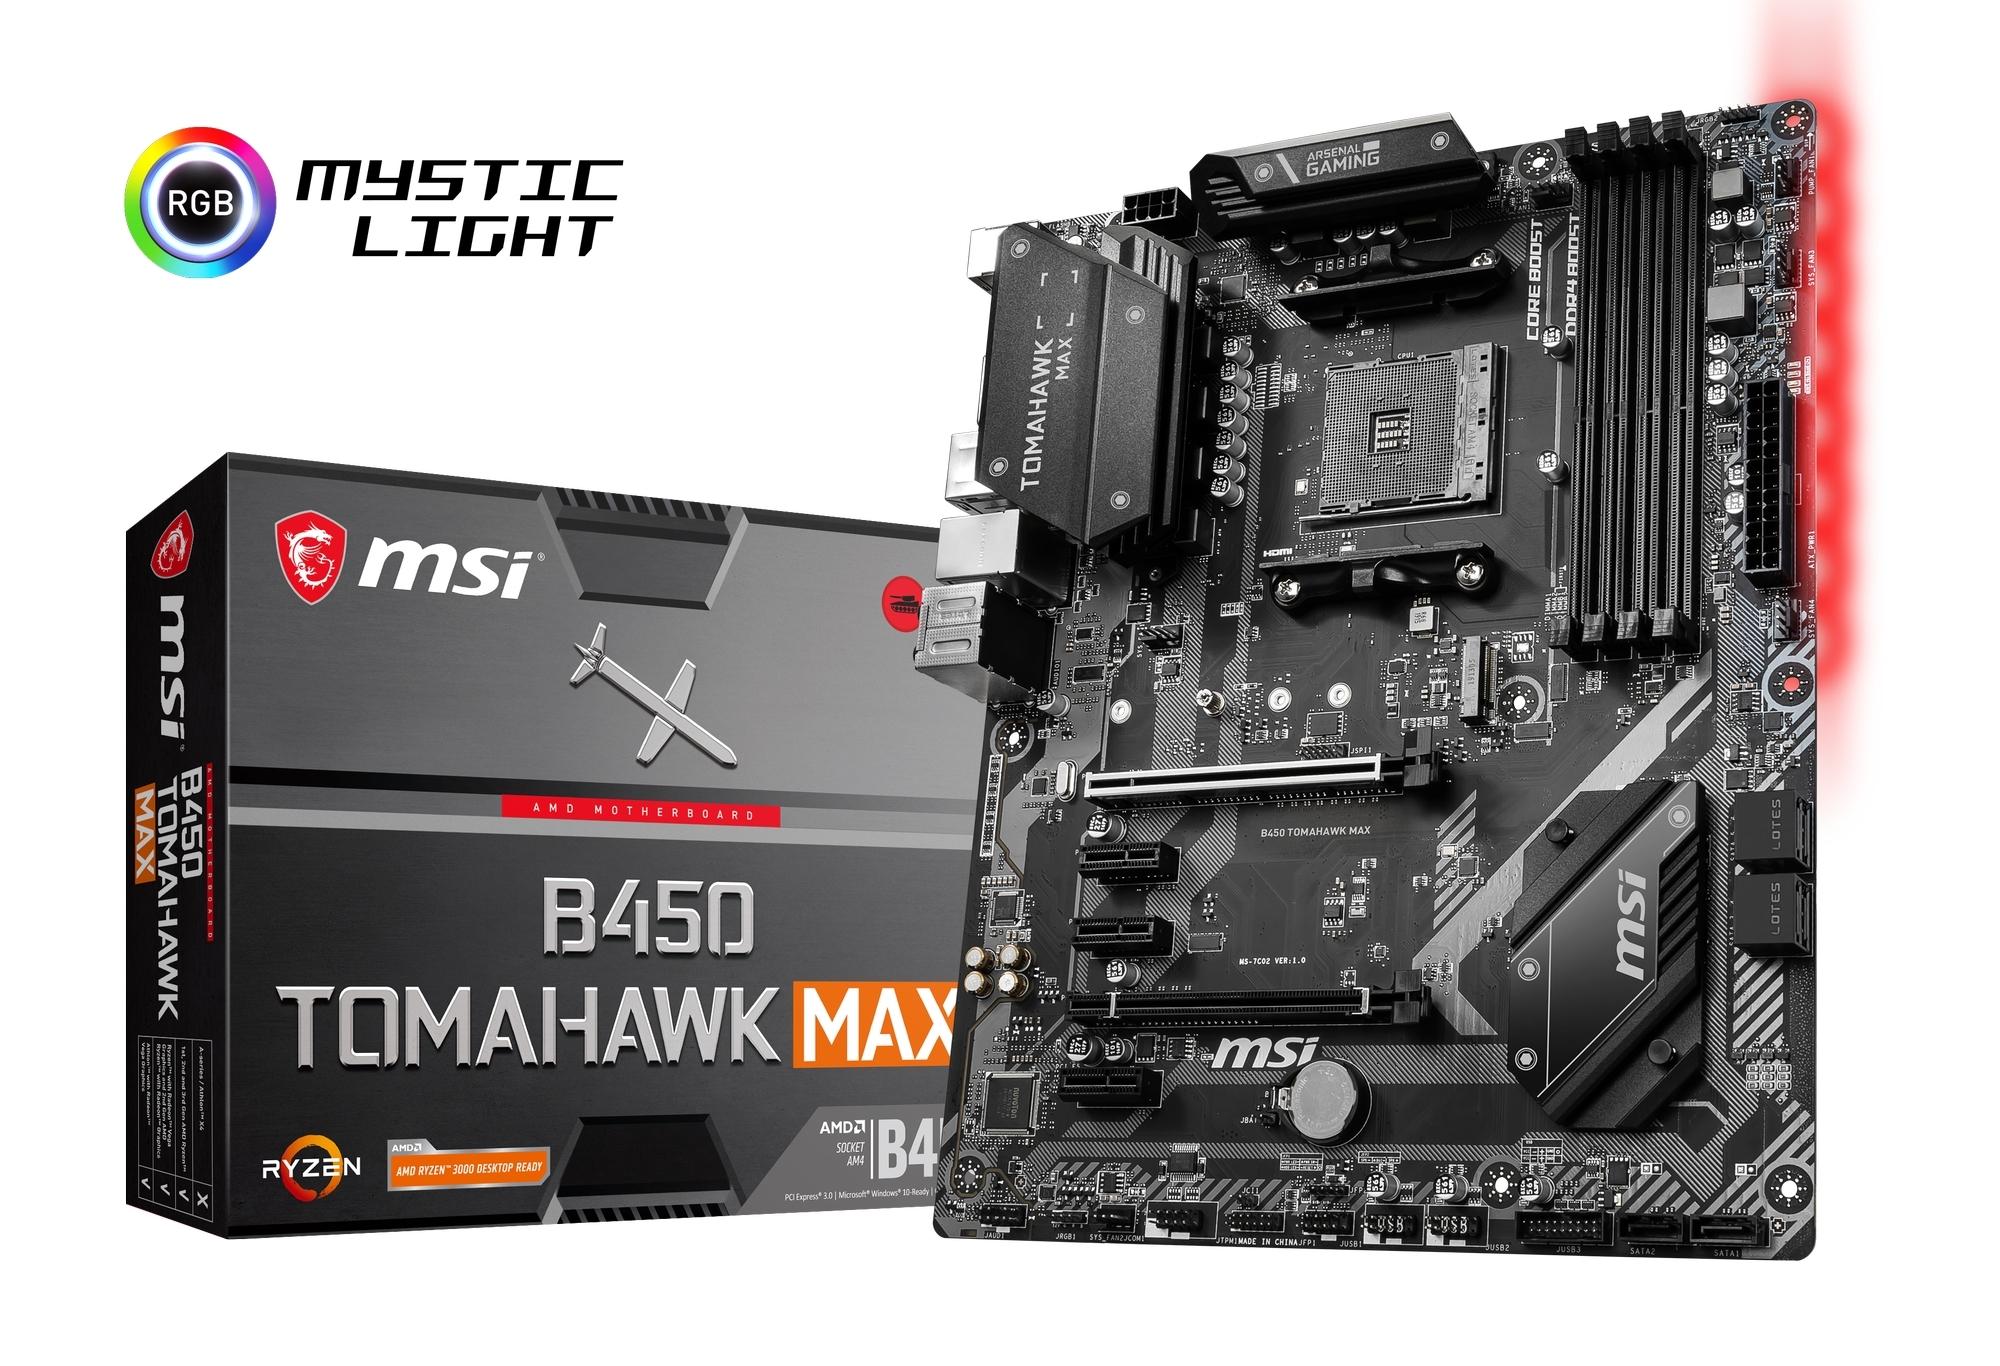 msi-b450-tomahawk-max-box.jpg [MS-15481123719086096-0019514153-FR]/Catalogue produit / Online